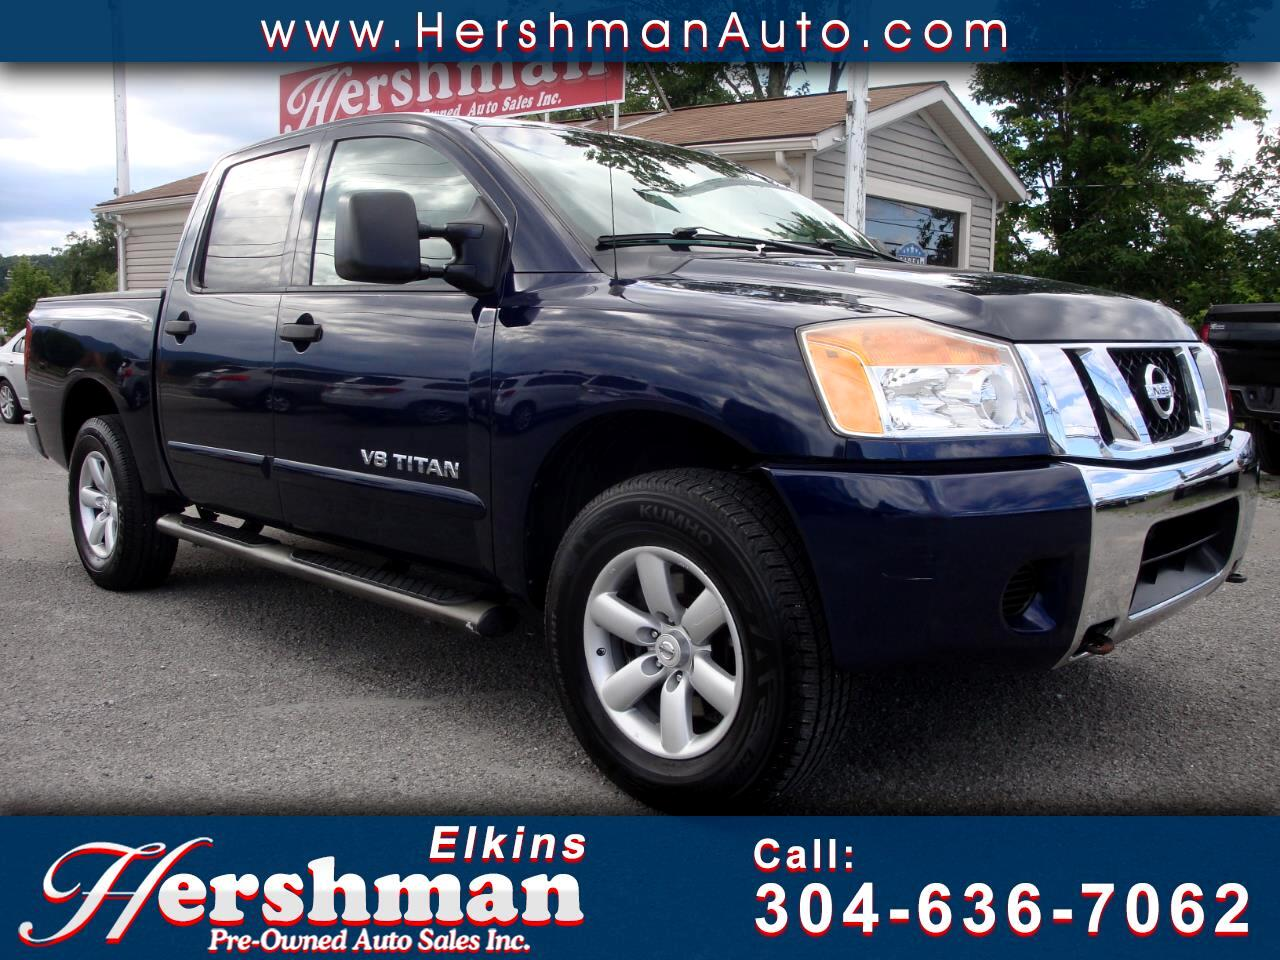 2008 Nissan Titan 4WD Crew Cab SE